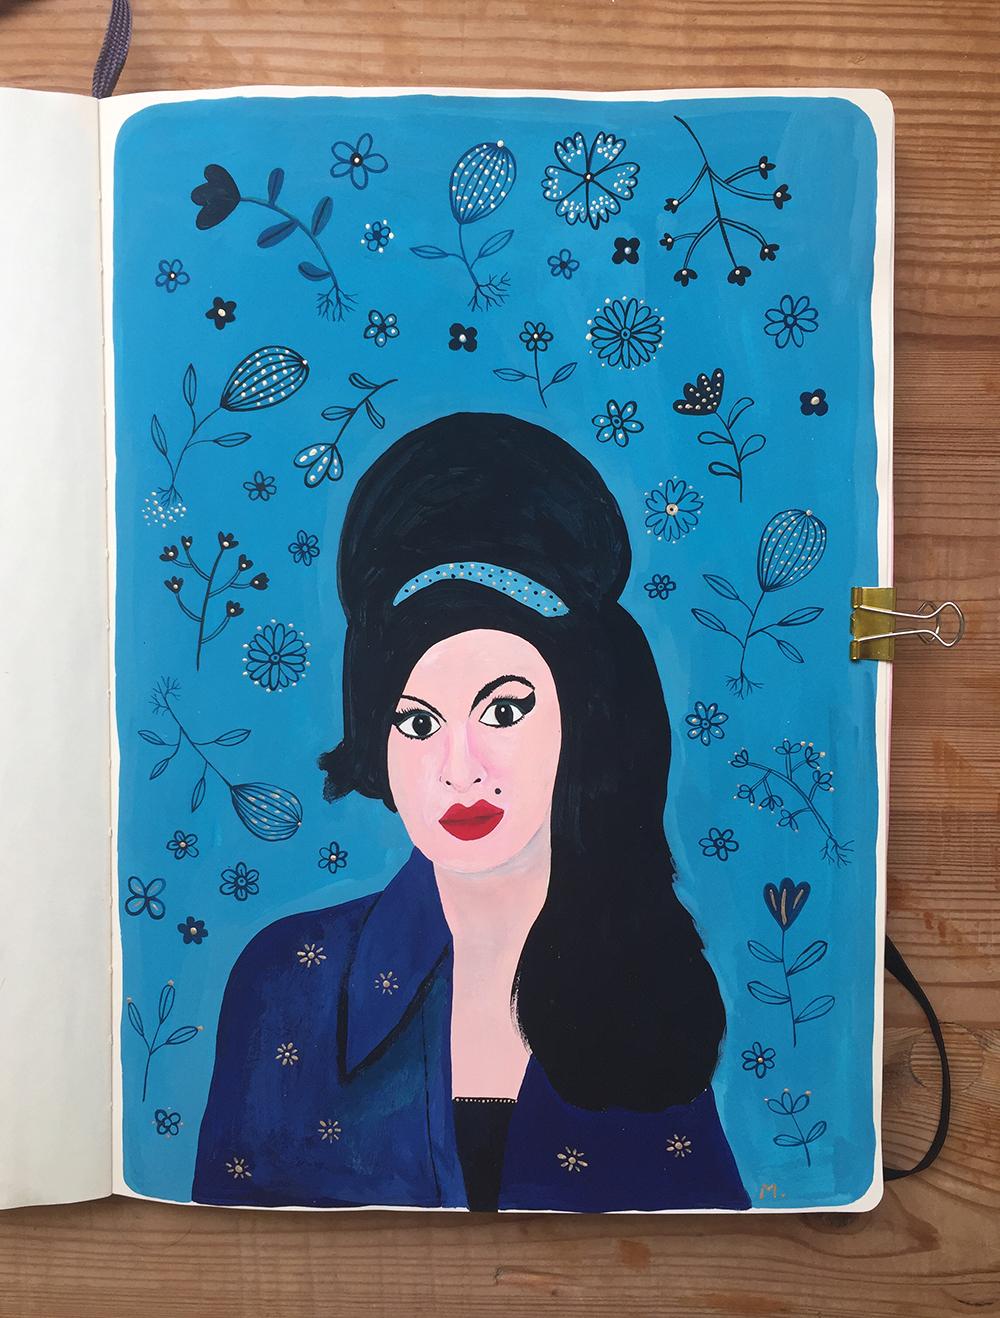 Amy Winehouse illustration by Marenthe